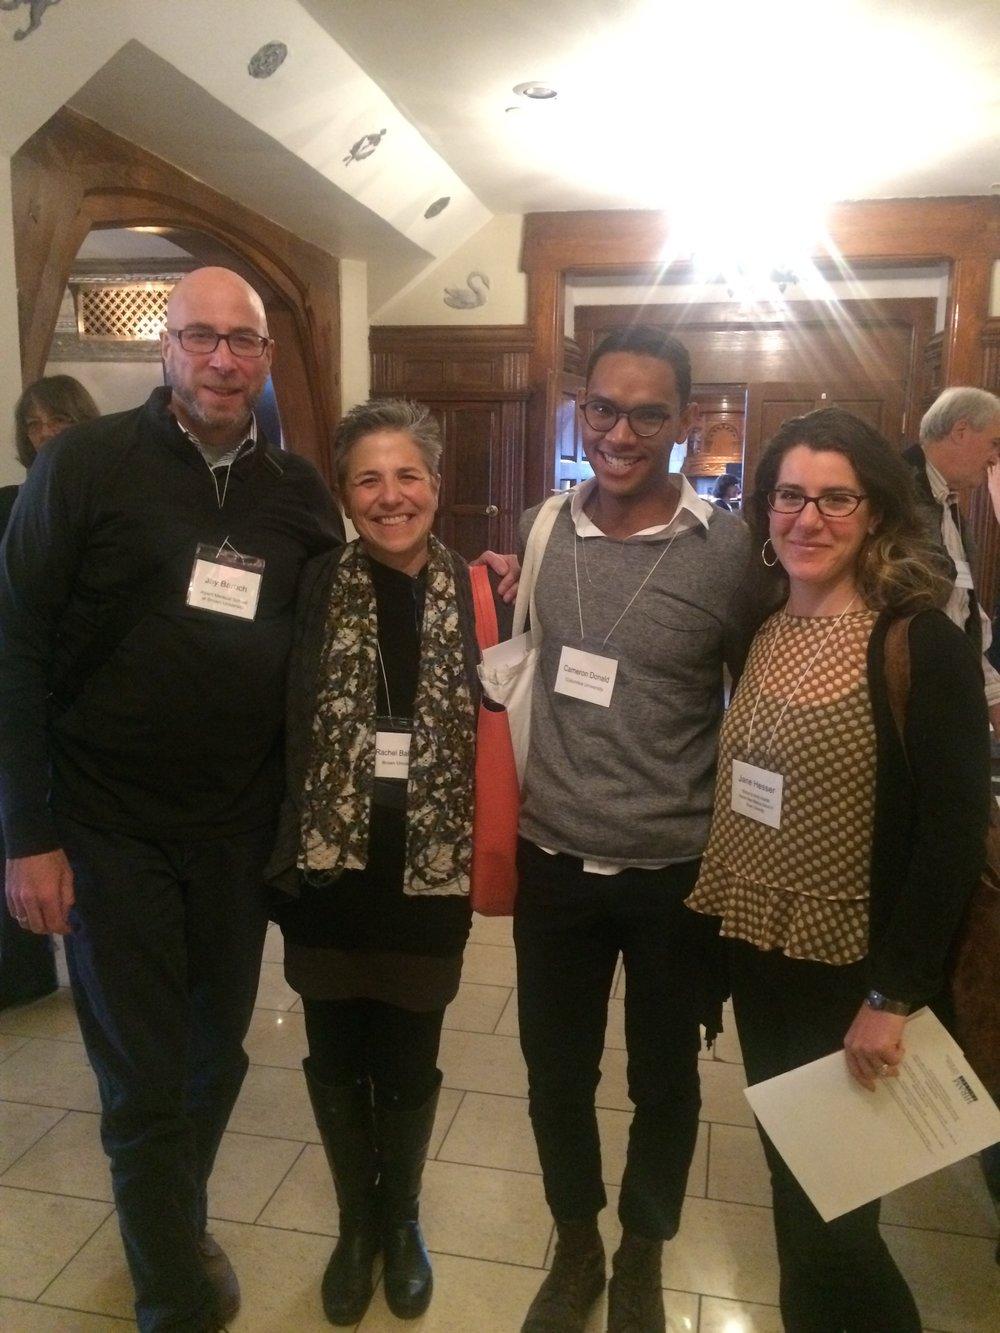 Dr. Jay Baruch, Rachel Balaban, Cameron Donald, Jane Hesser